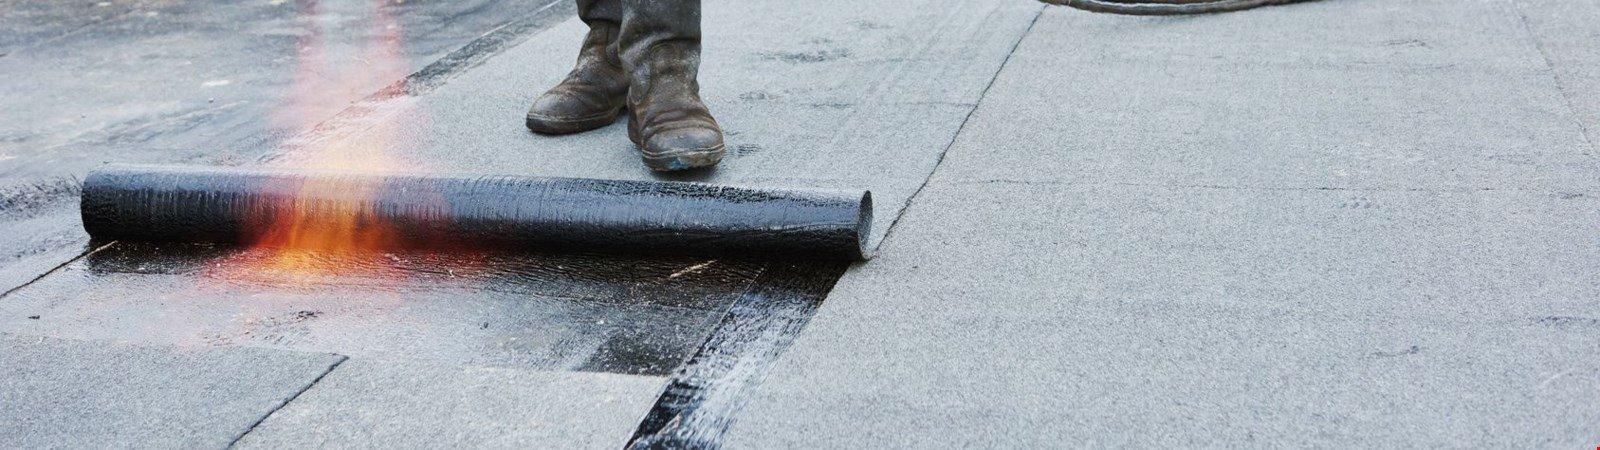 Flachdachabdichtung: Dachwartung für Flachdächer